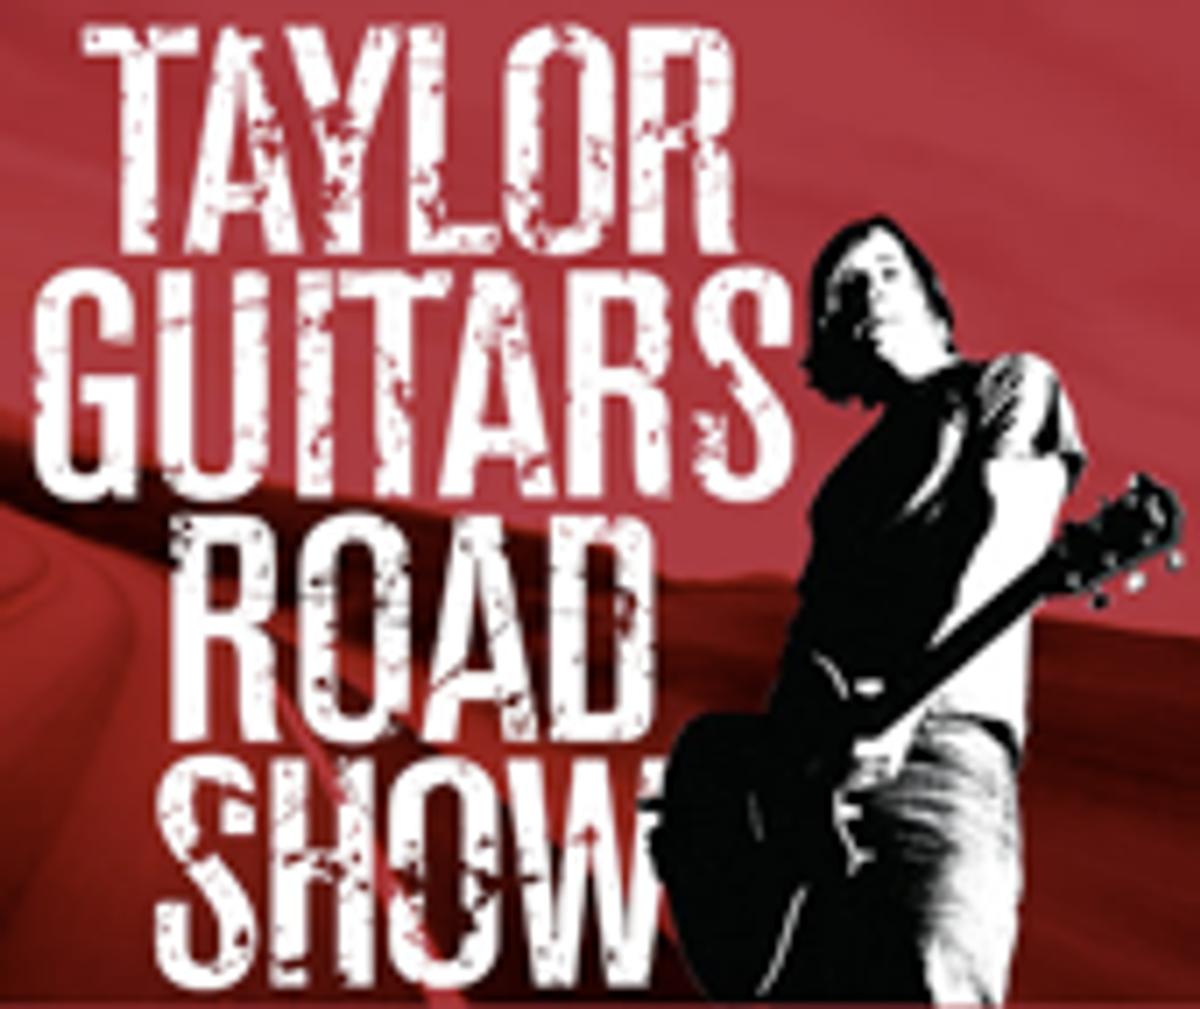 Taylor Guitars 2008 Road Shows